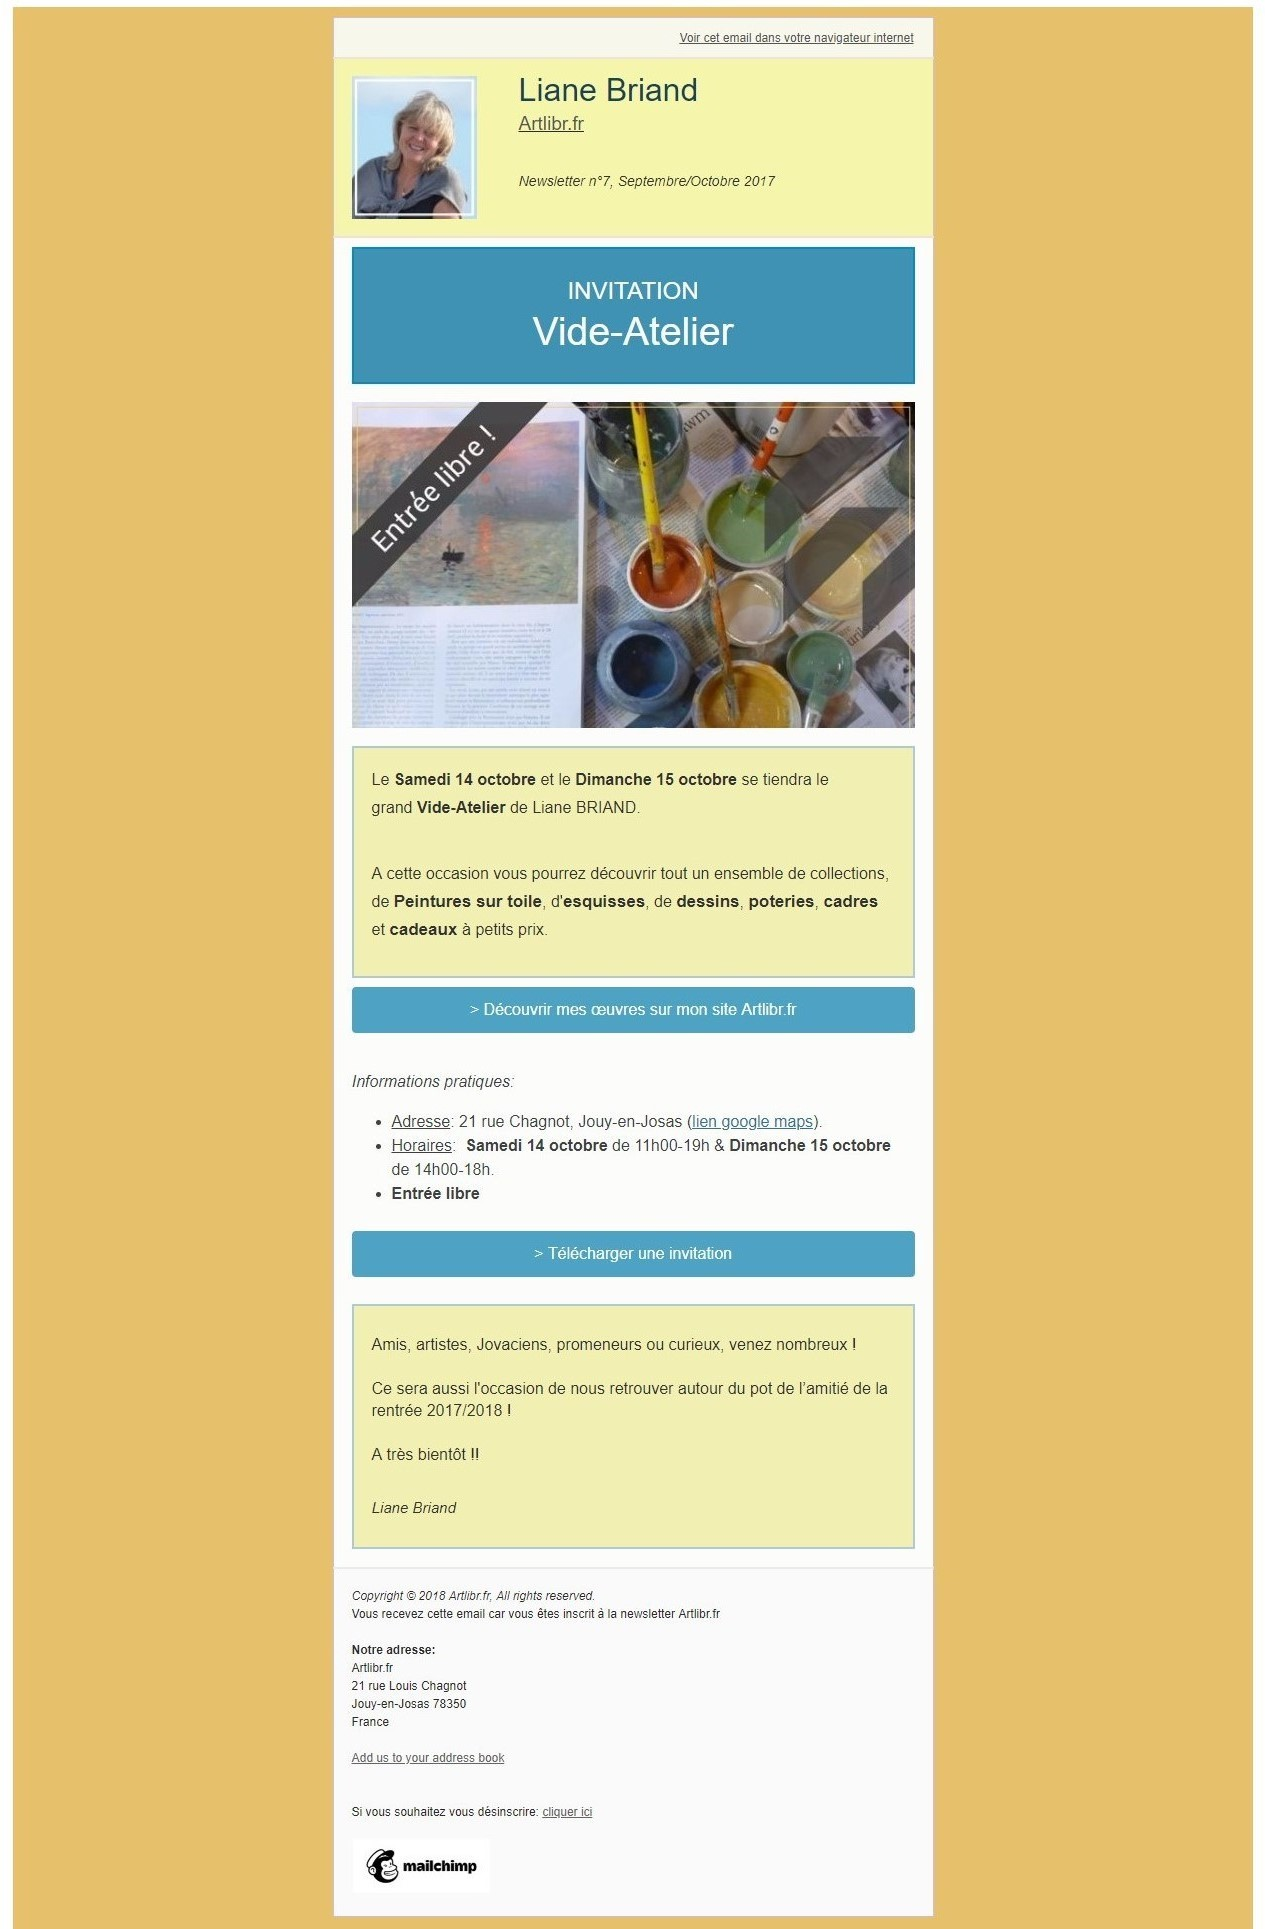 Newsletter N°7 Artlibr.Fr: Vide Atelier Chez Liane Briand!